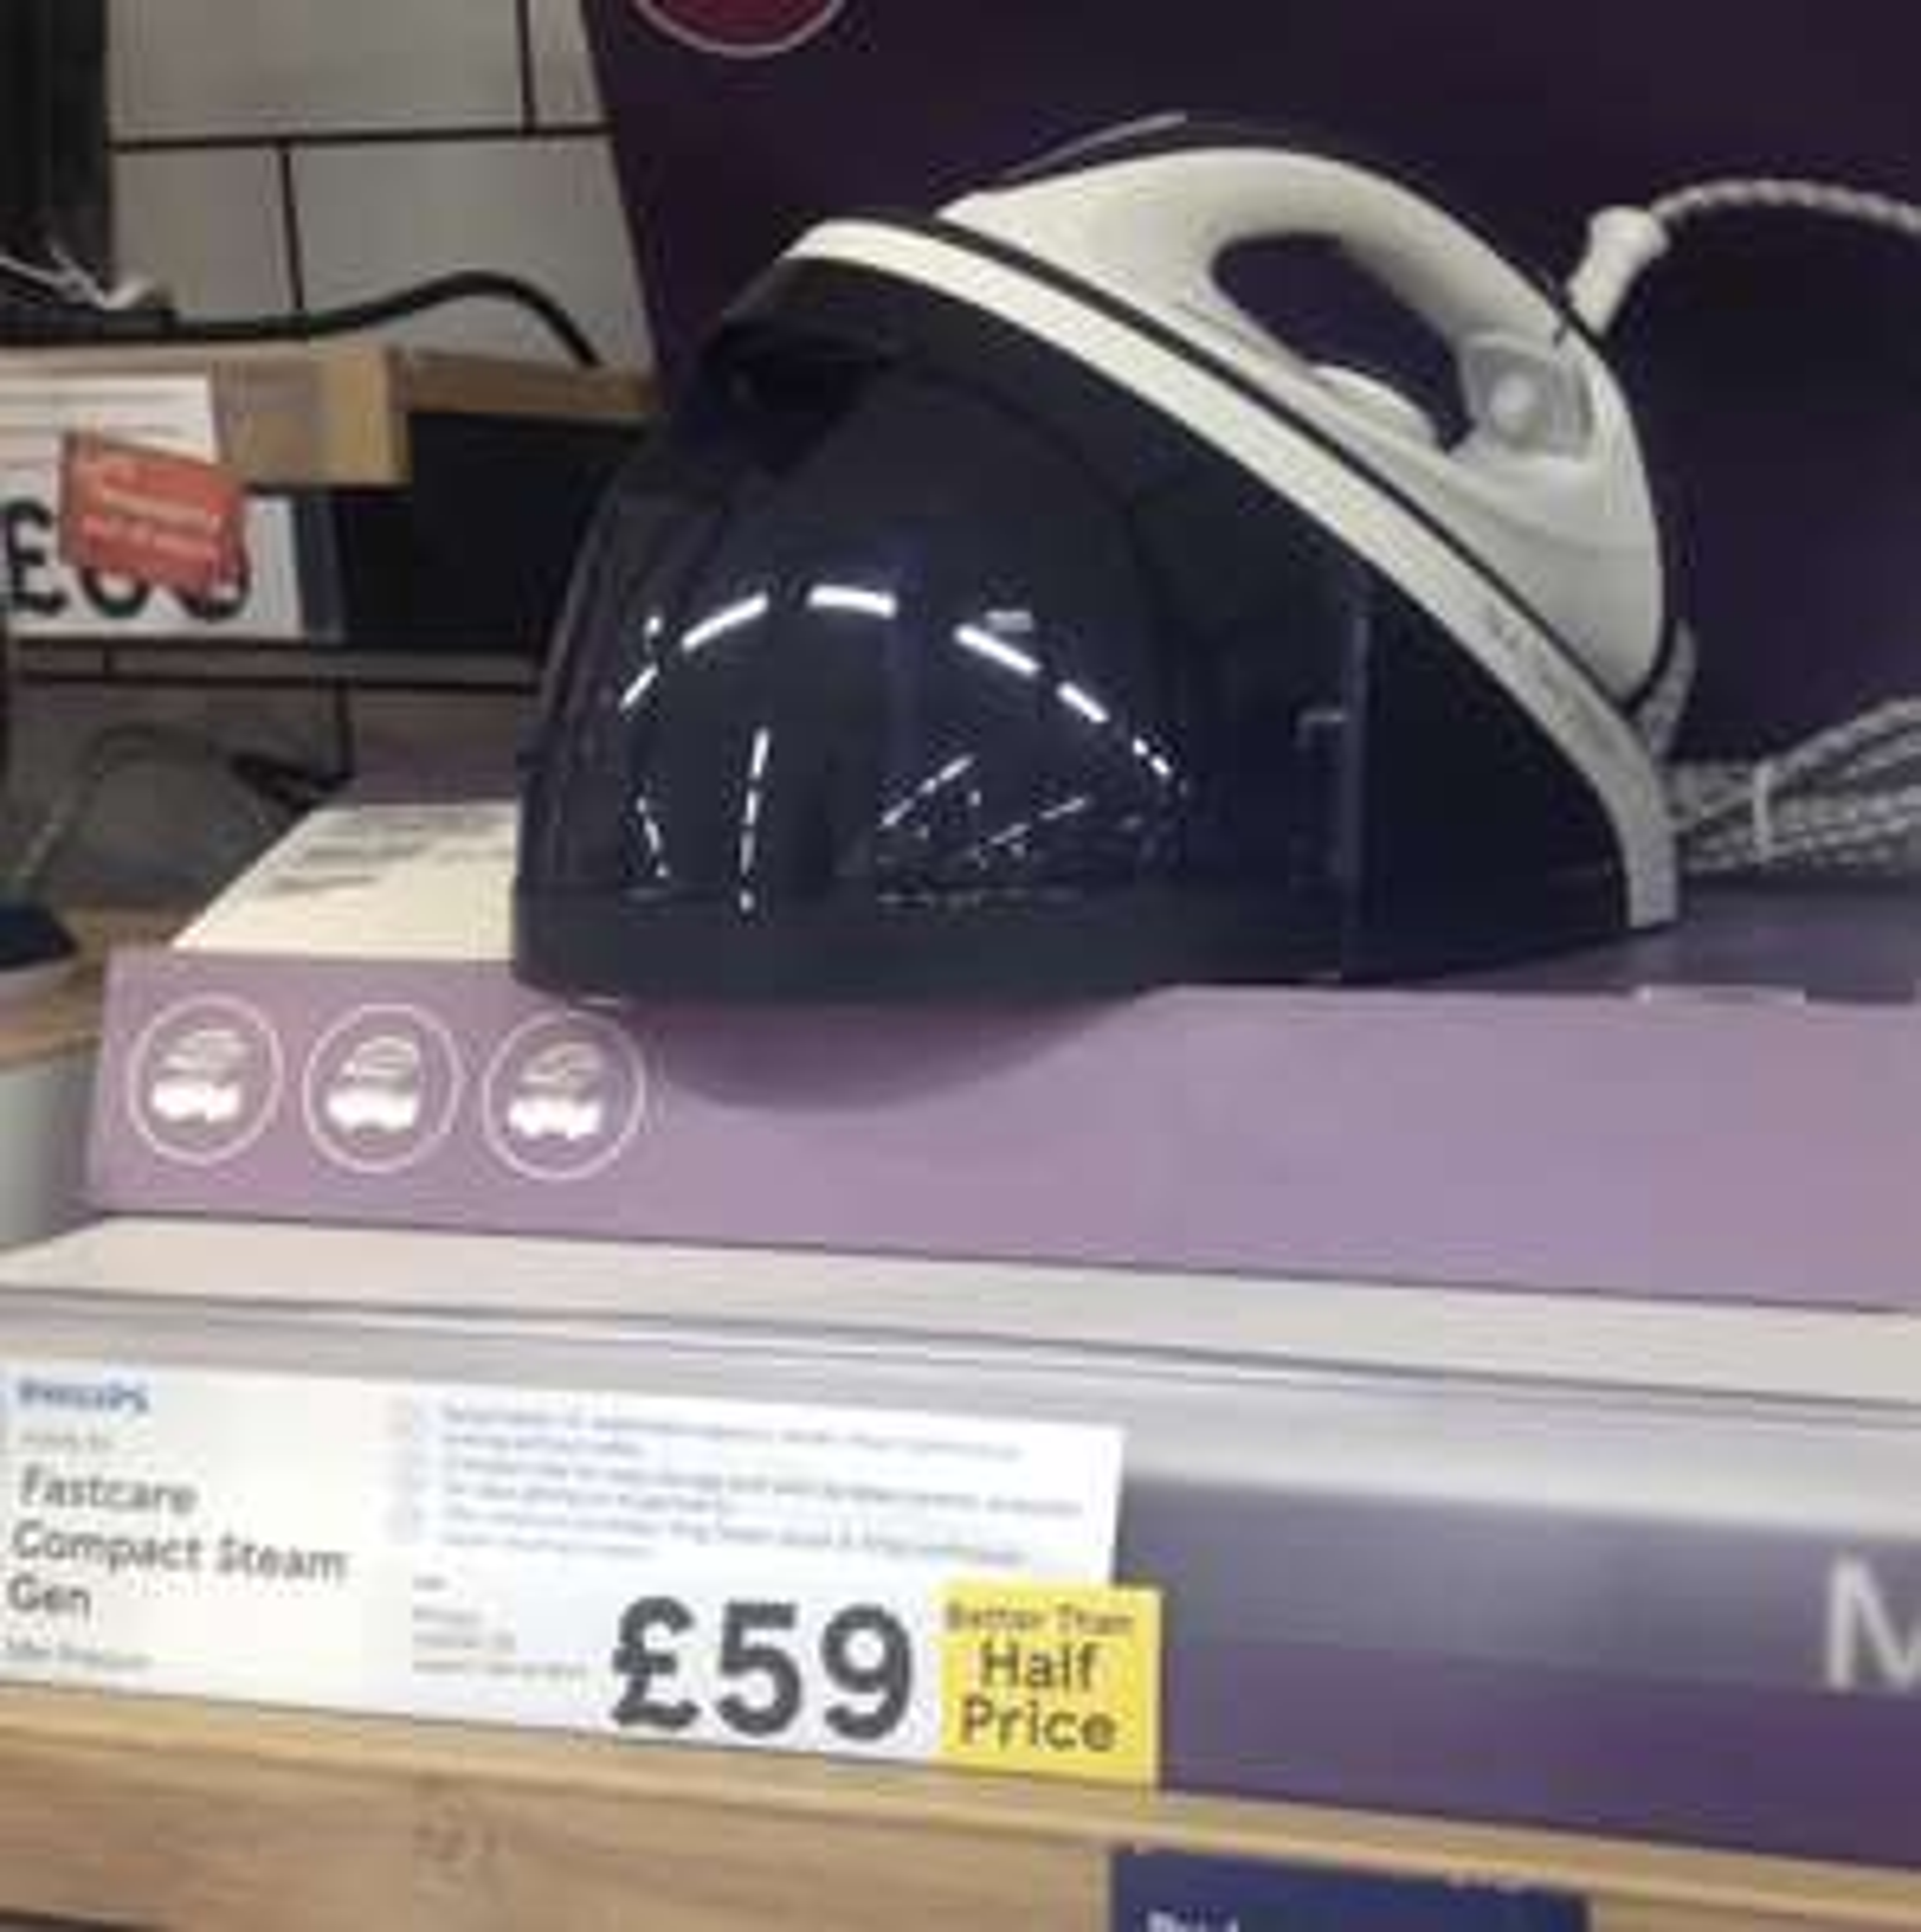 Philips Steam Generator Iron HI5916/26 better than half price £59.99 in store at Tesco